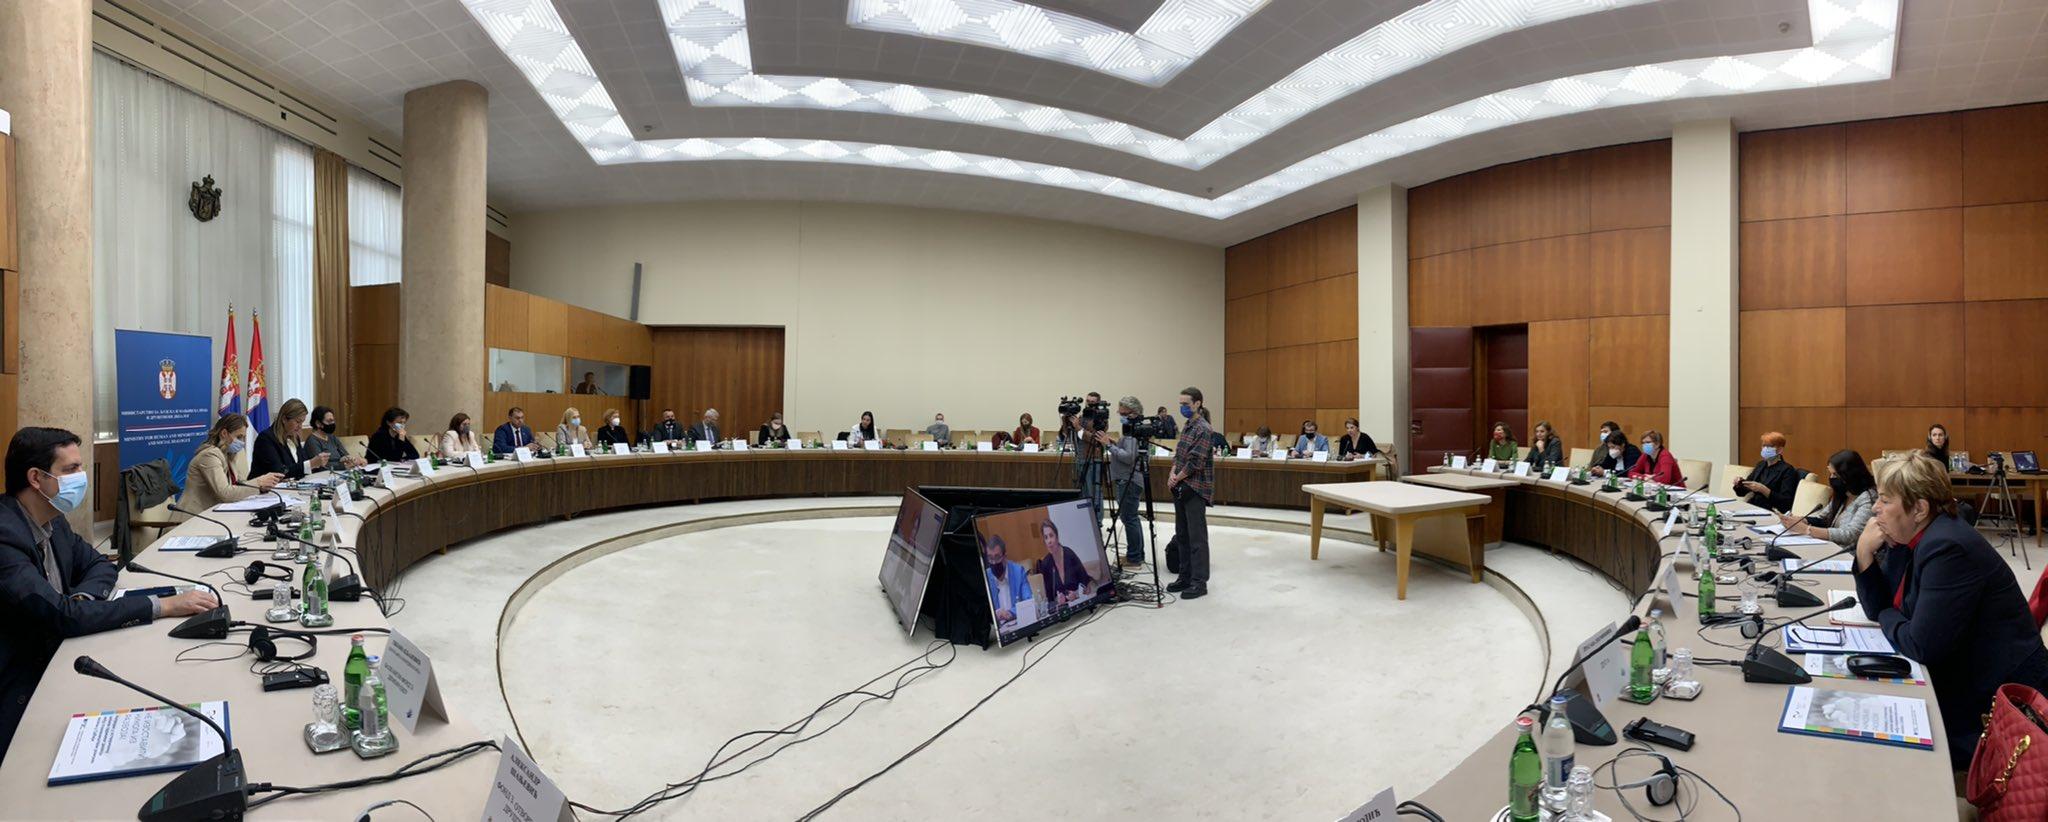 Roma economic empowerment in relation to SDGs in Serbia